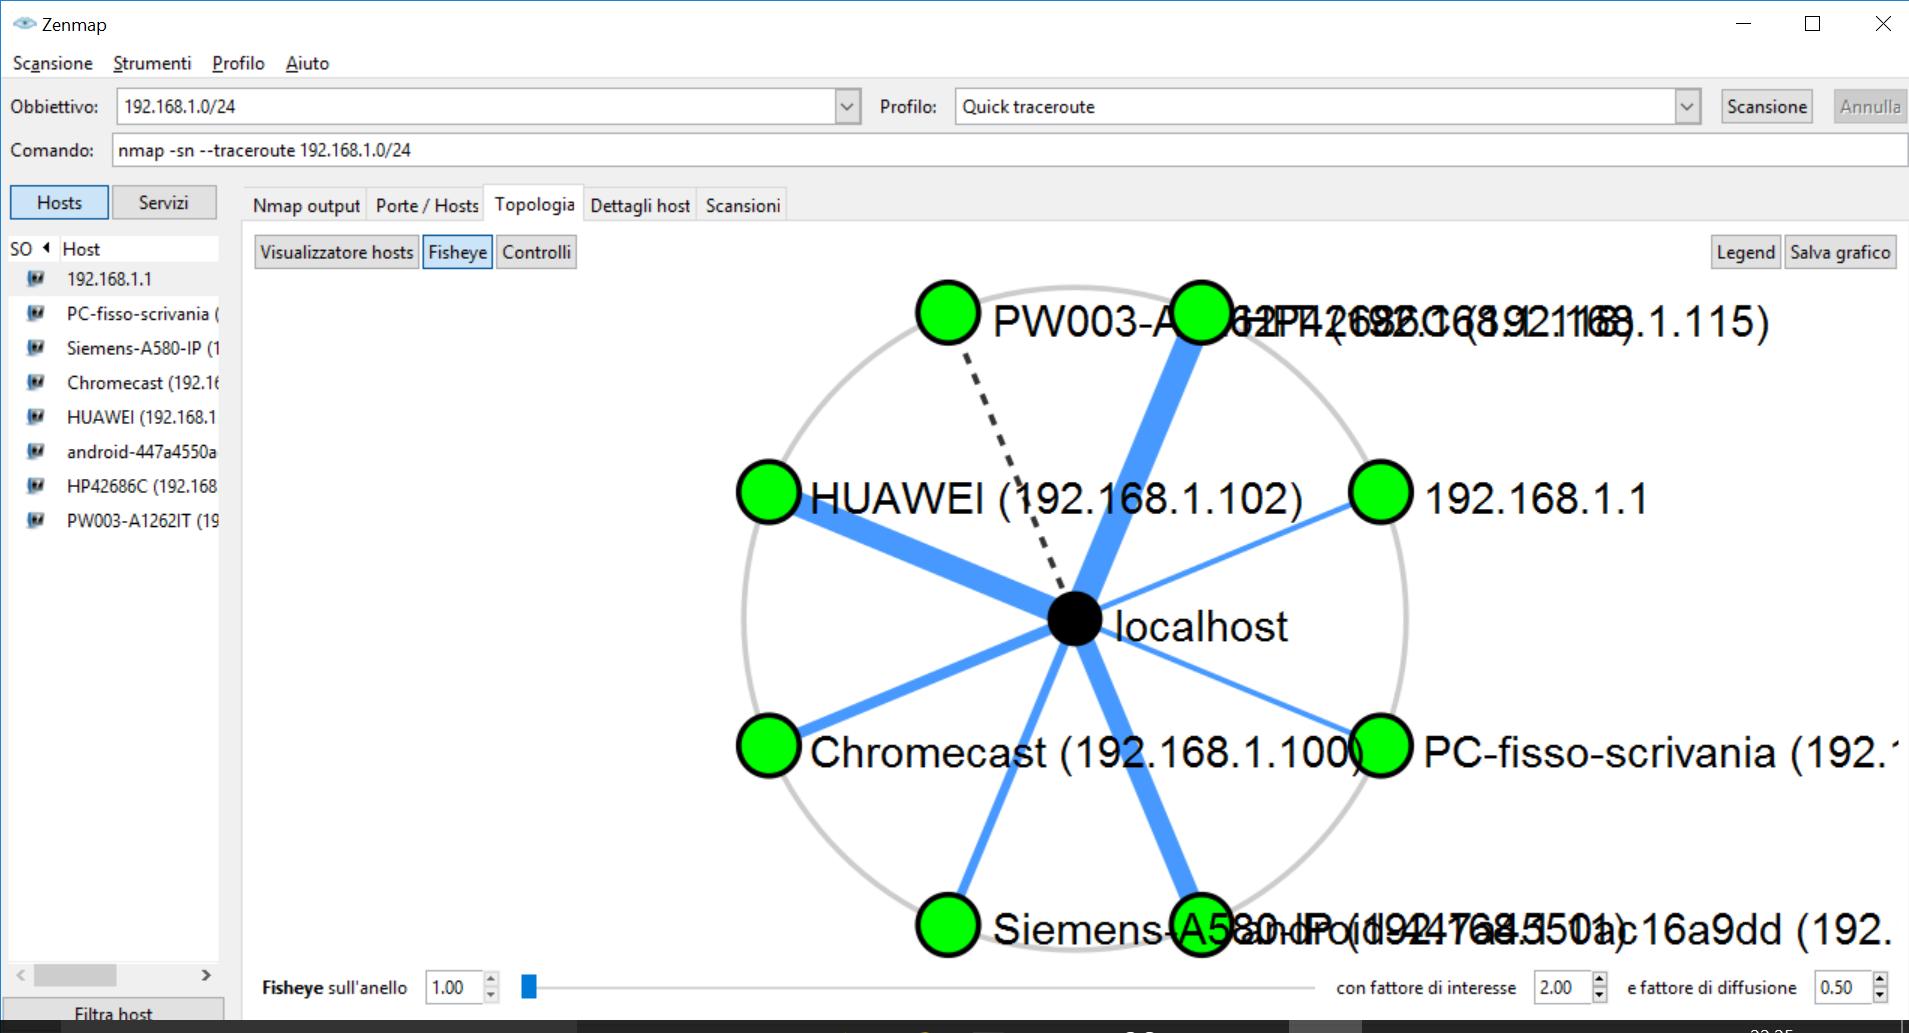 Nmap tutorial: How to Use nmap and ZenMap - ICTShore com